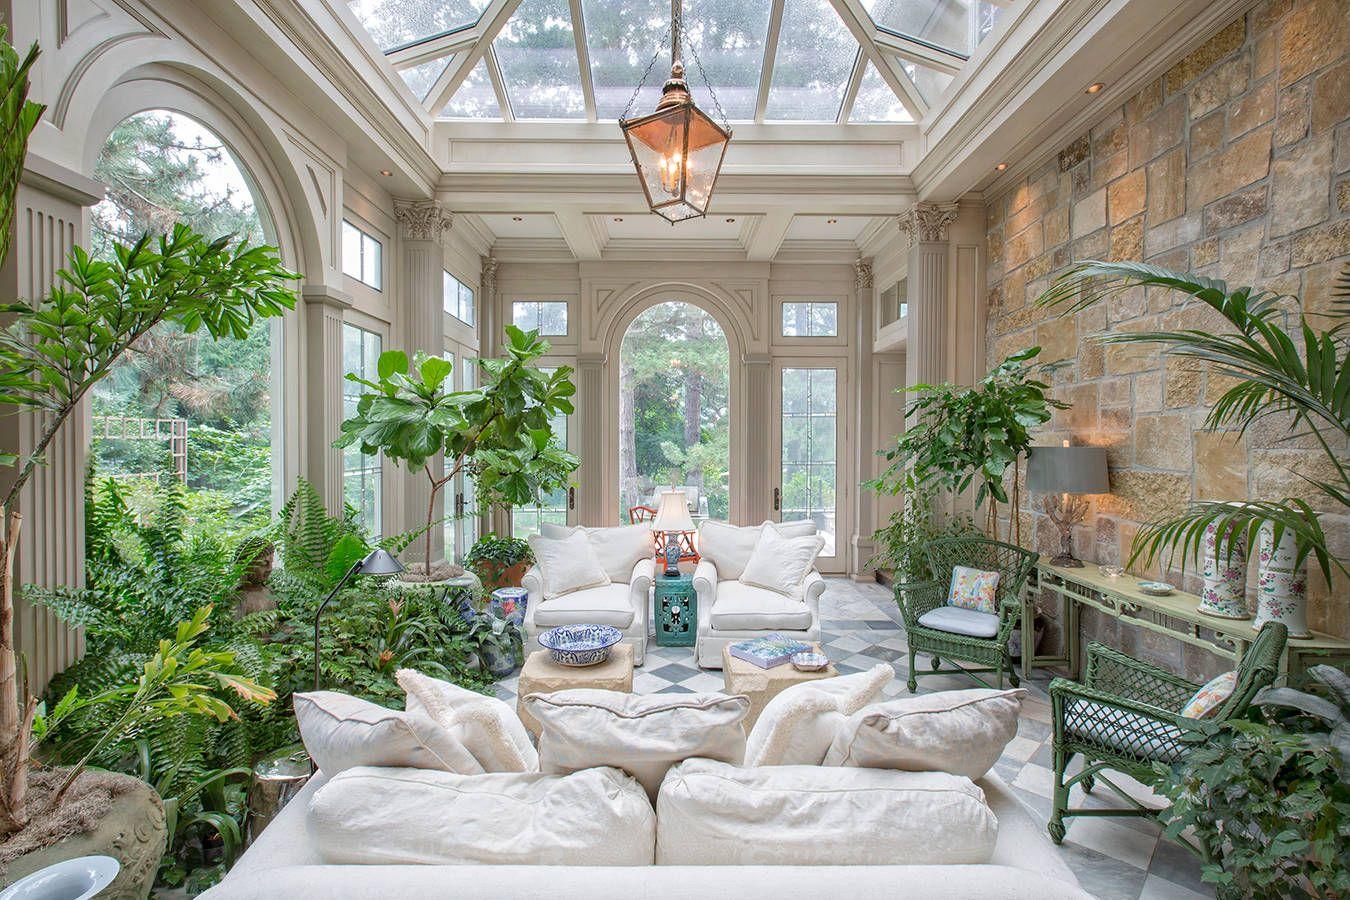 Traditional Sunroom Blends Indoor & Outdoor Greenery